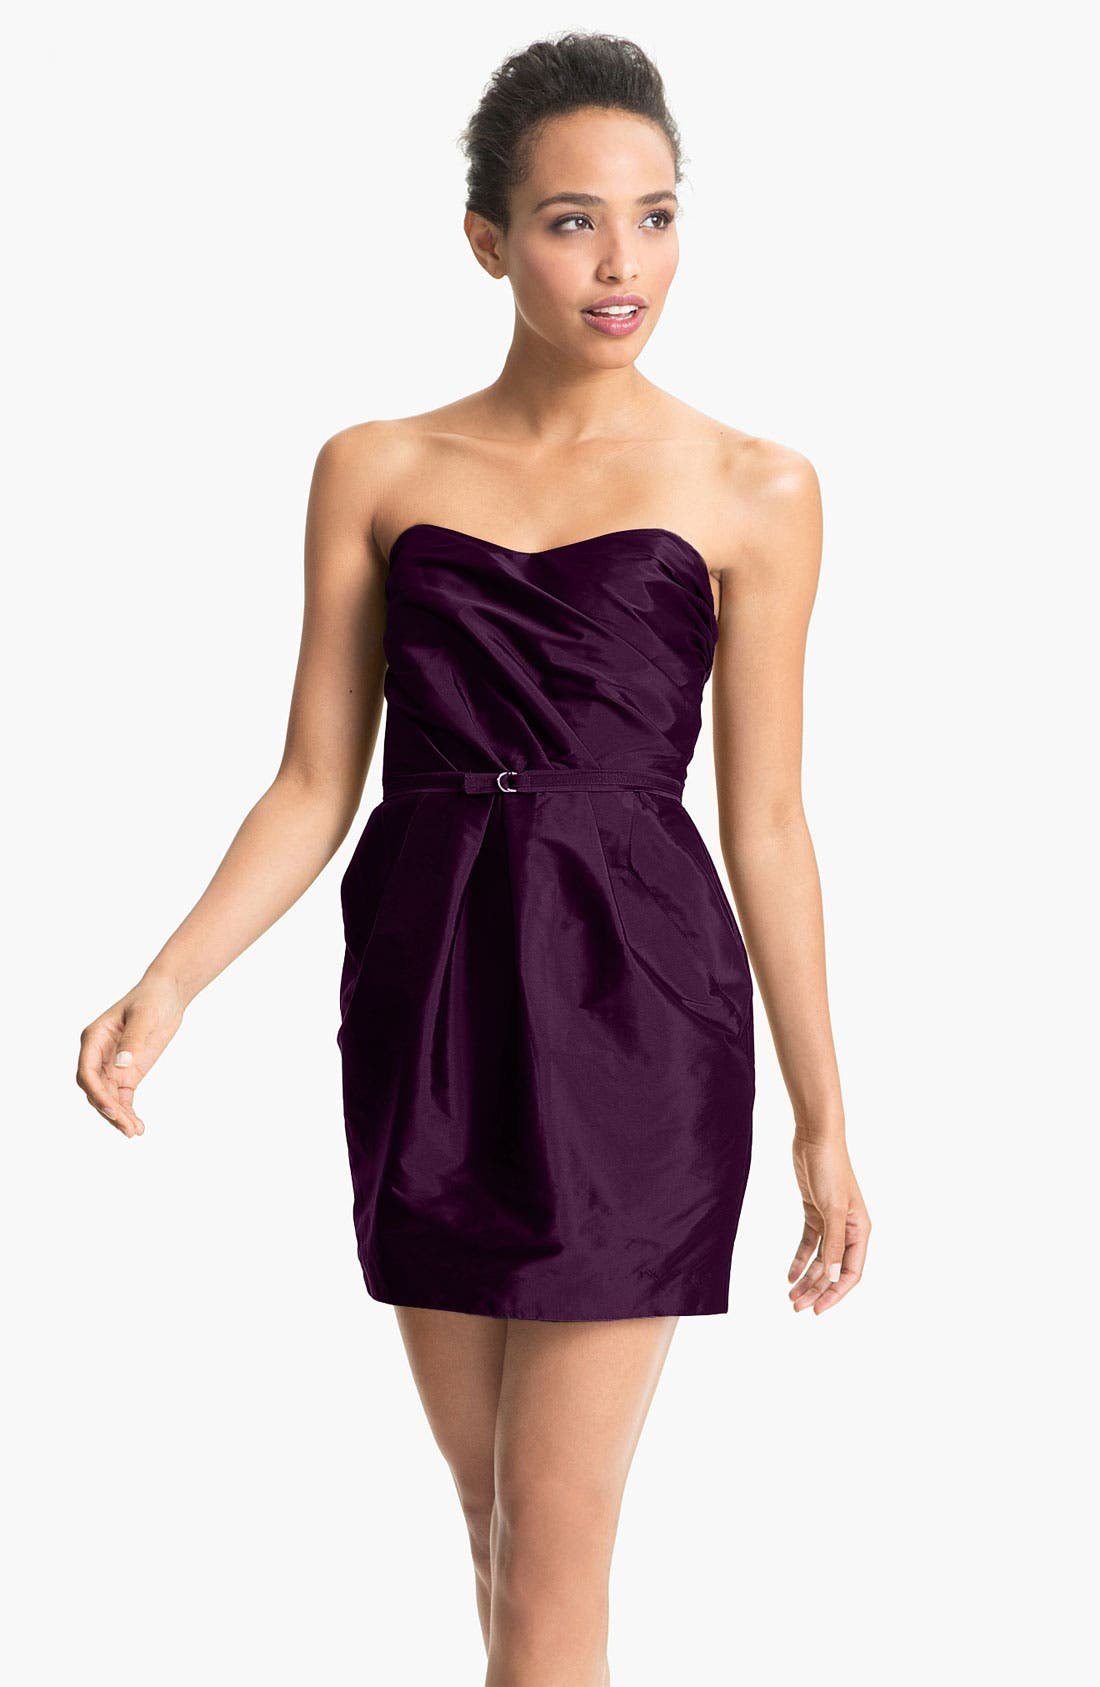 Main Image - Alexia Admor Strapless Taffeta Tulip Dress